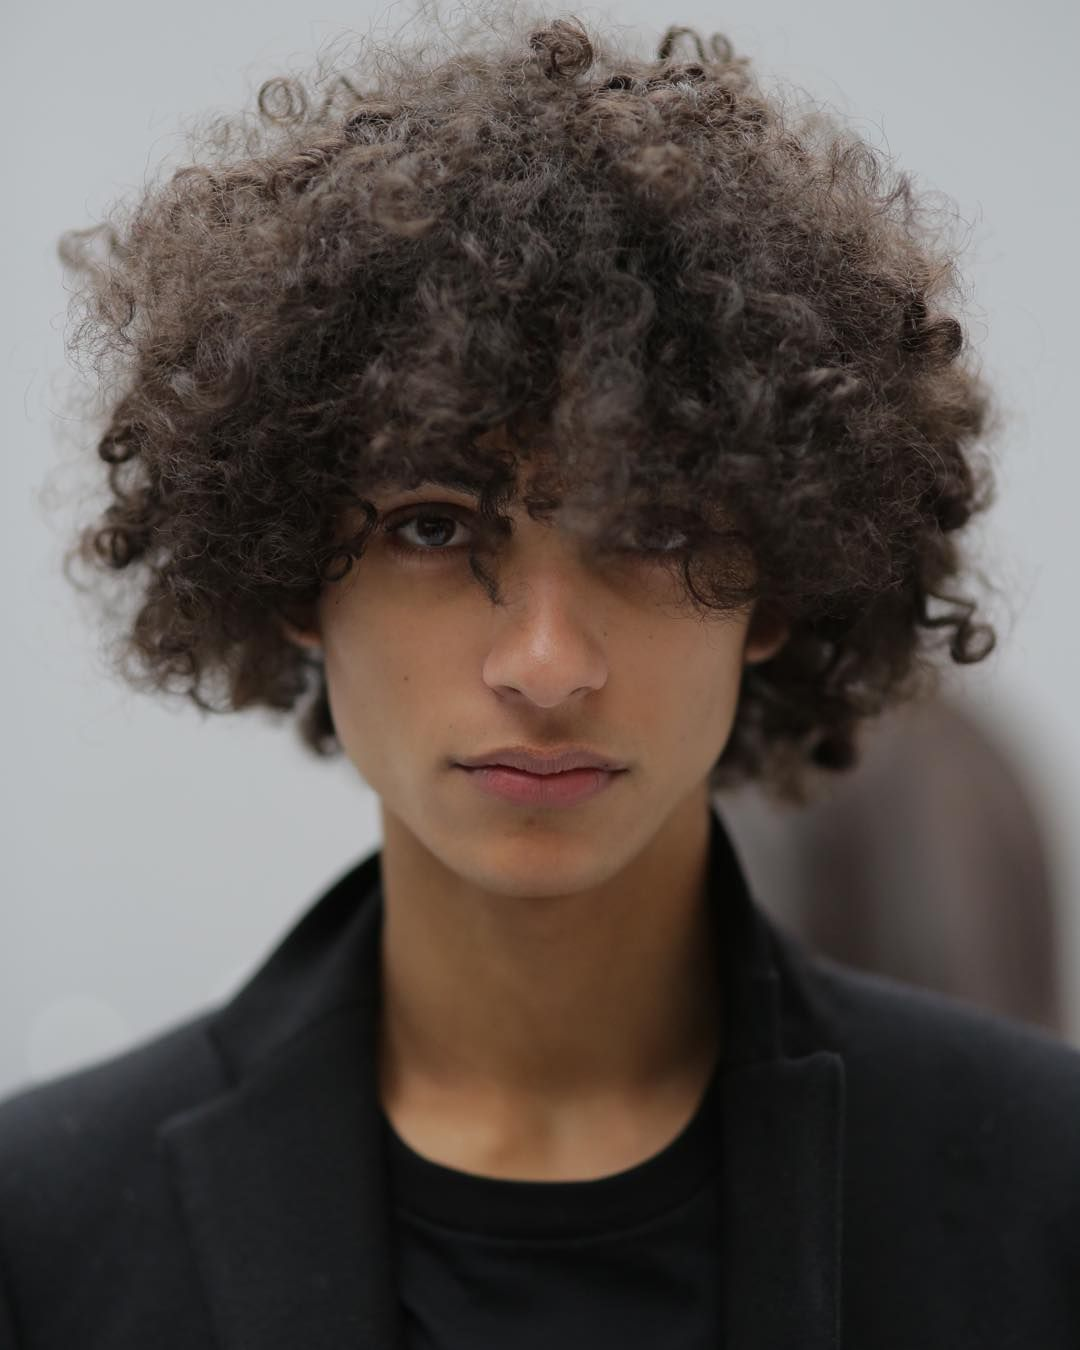 Soap Mactavish Haircut The Best Haircut Of 2018